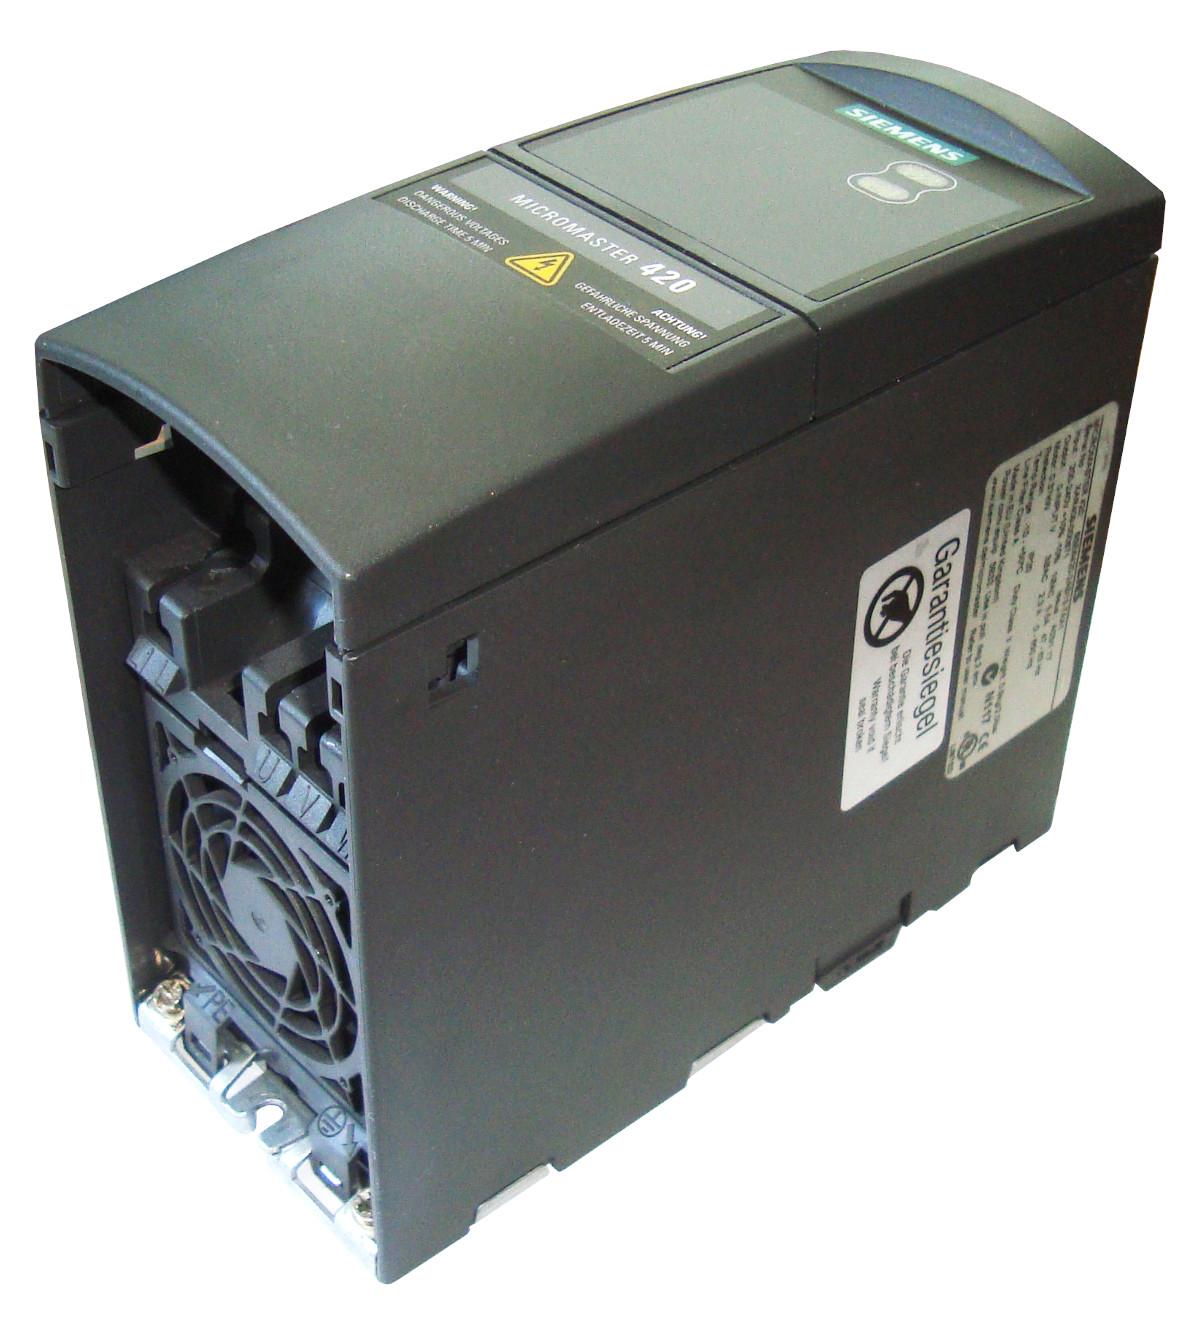 3 Austausch 6se6420-2ab13-7aa1 Micromaster Ac-drive